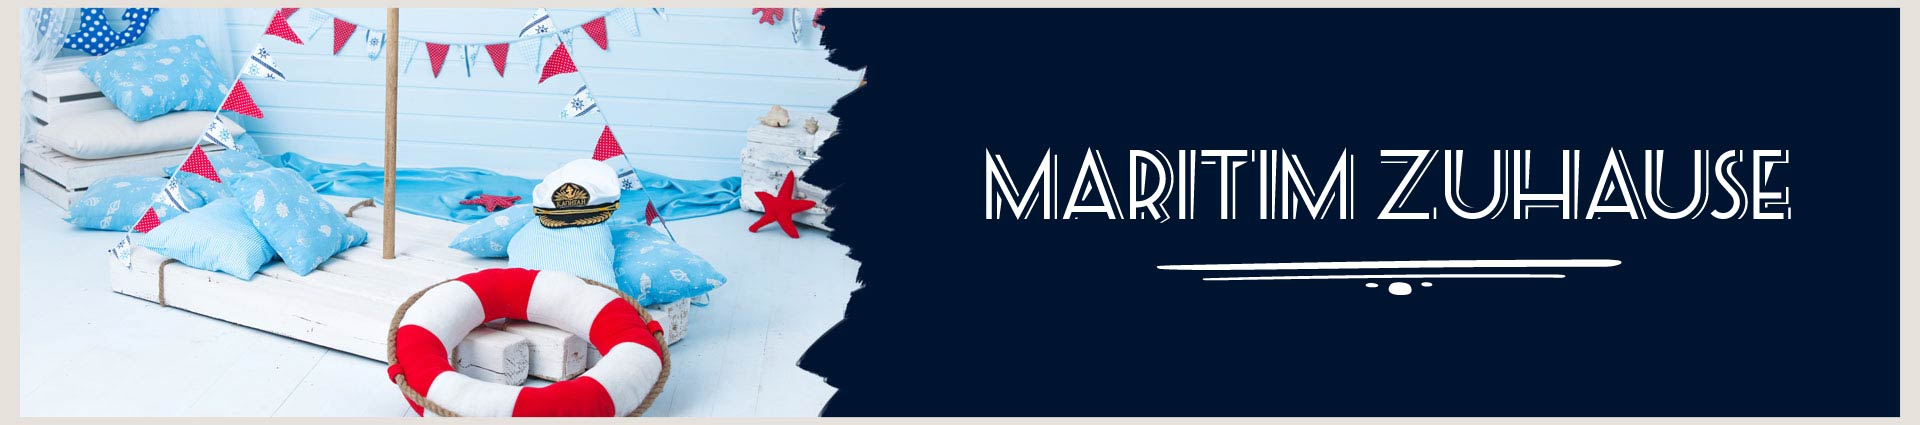 Maritim Zuhause Banner